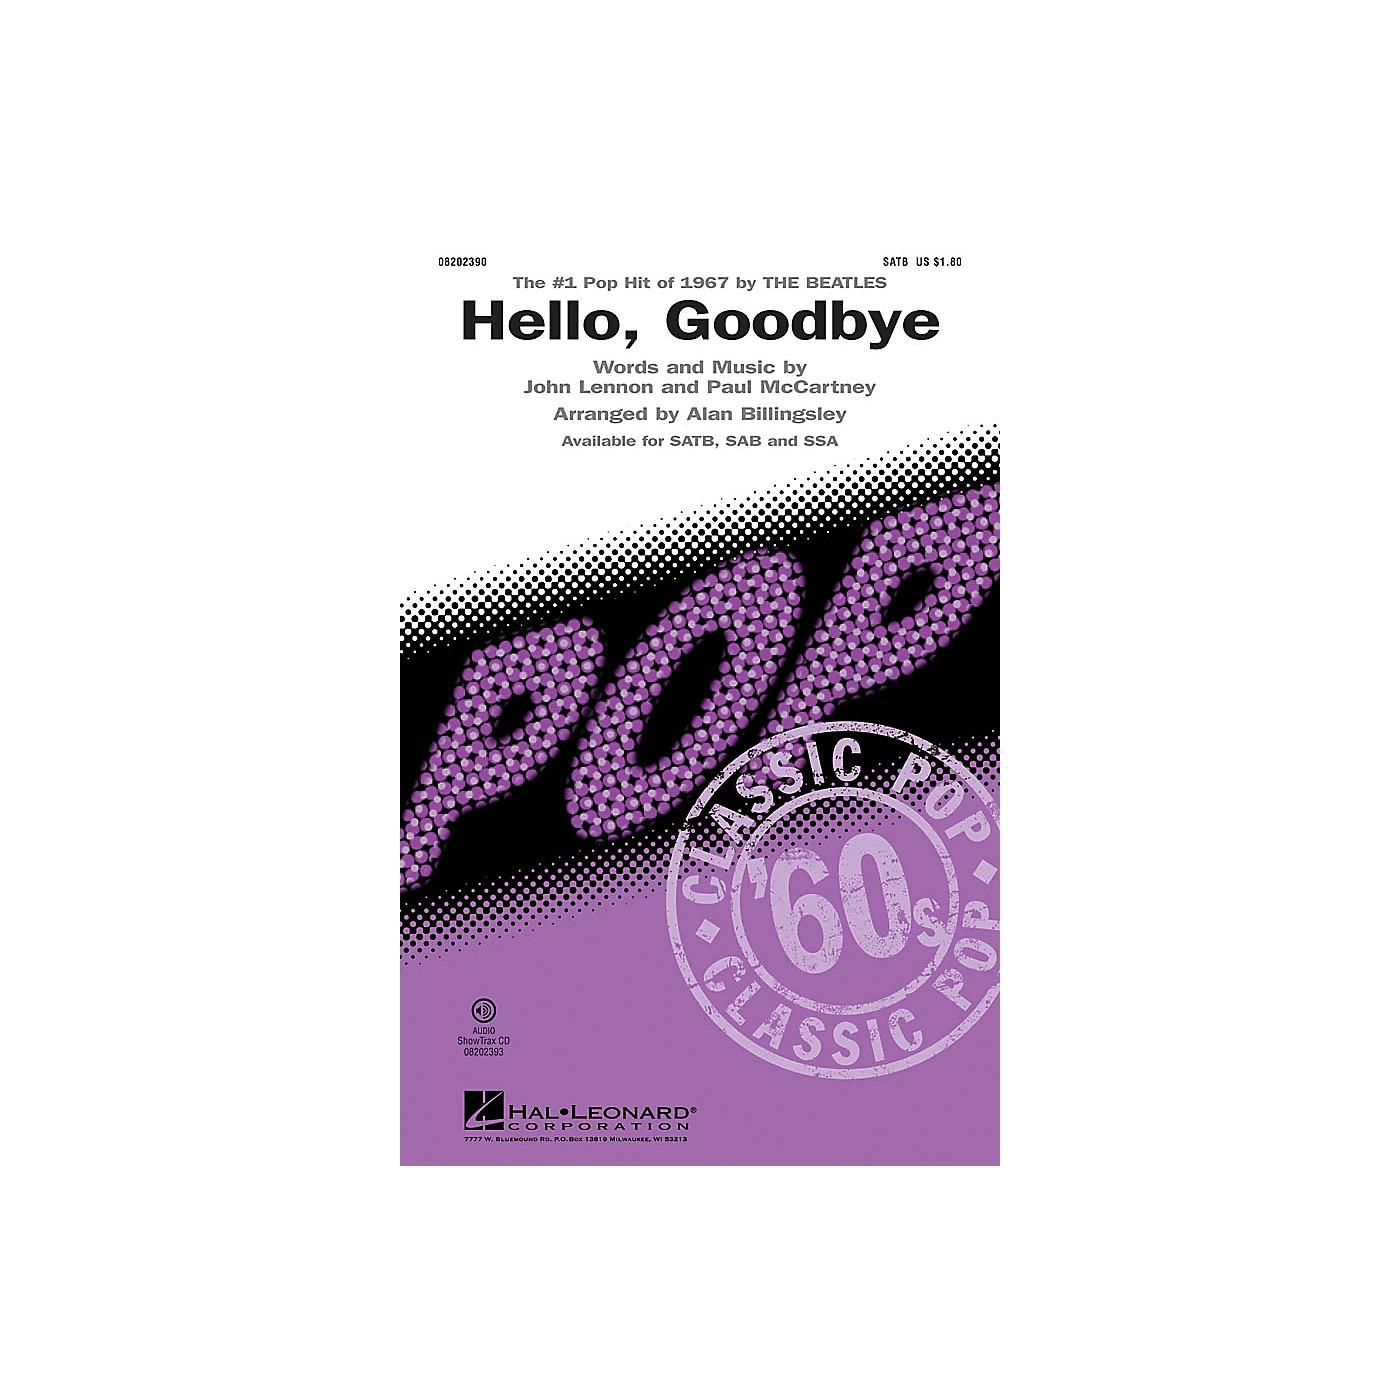 Hal Leonard Hello, Goodbye SSA by The Beatles Arranged by Alan Billingsley thumbnail